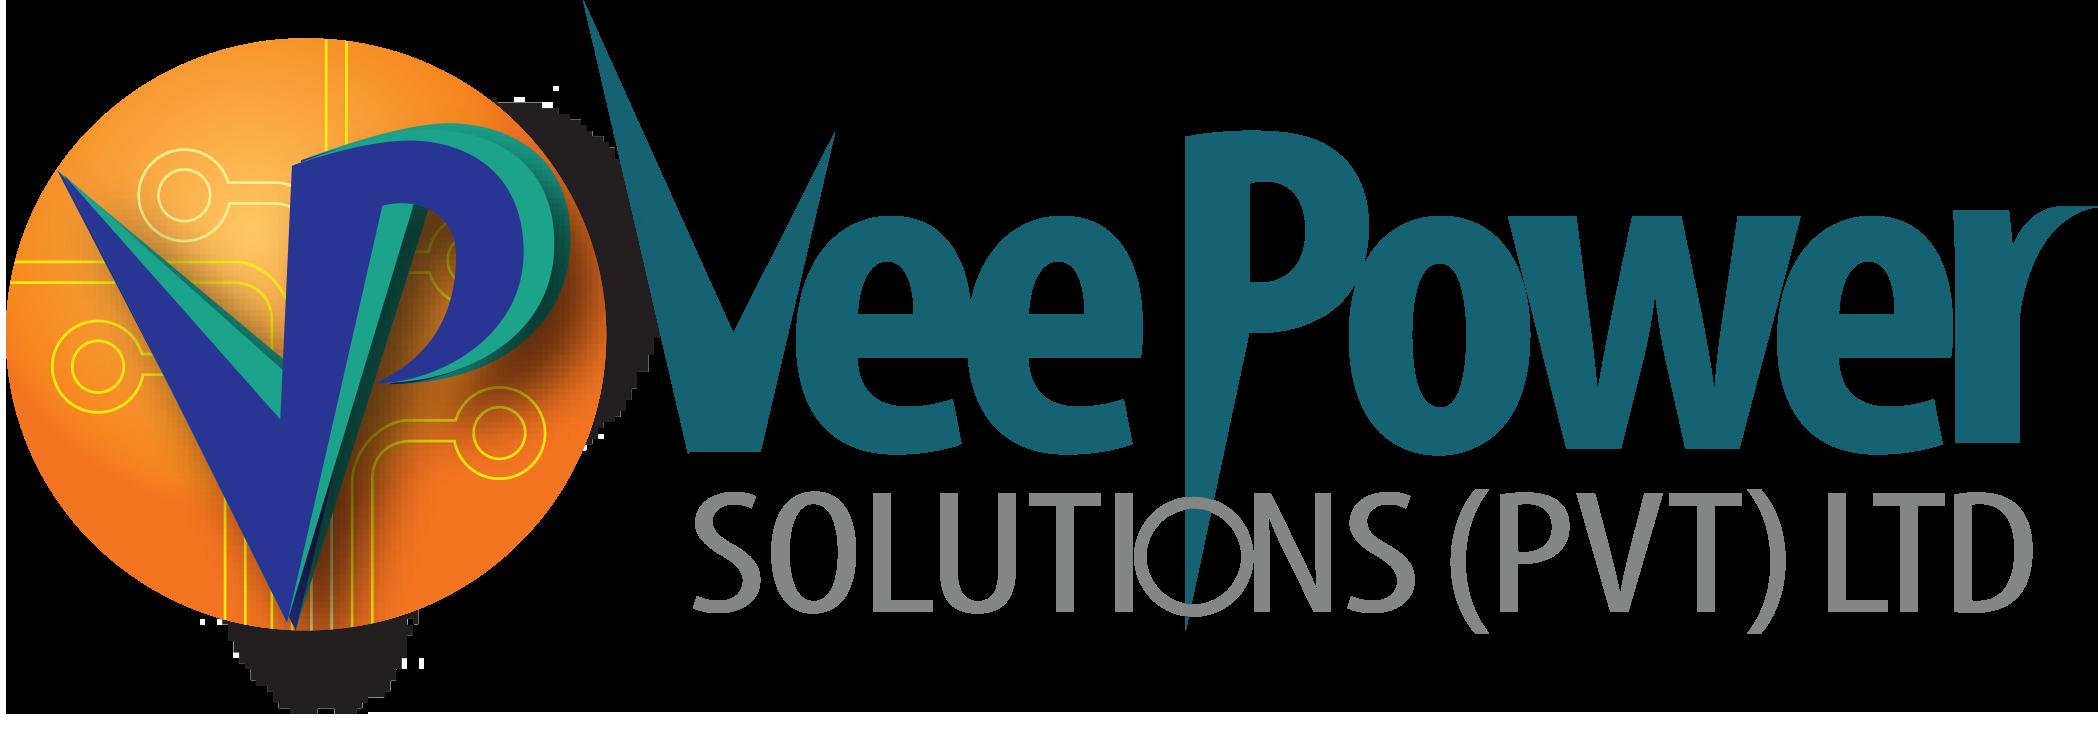 VeePower Solutions (Pvt) Ltd